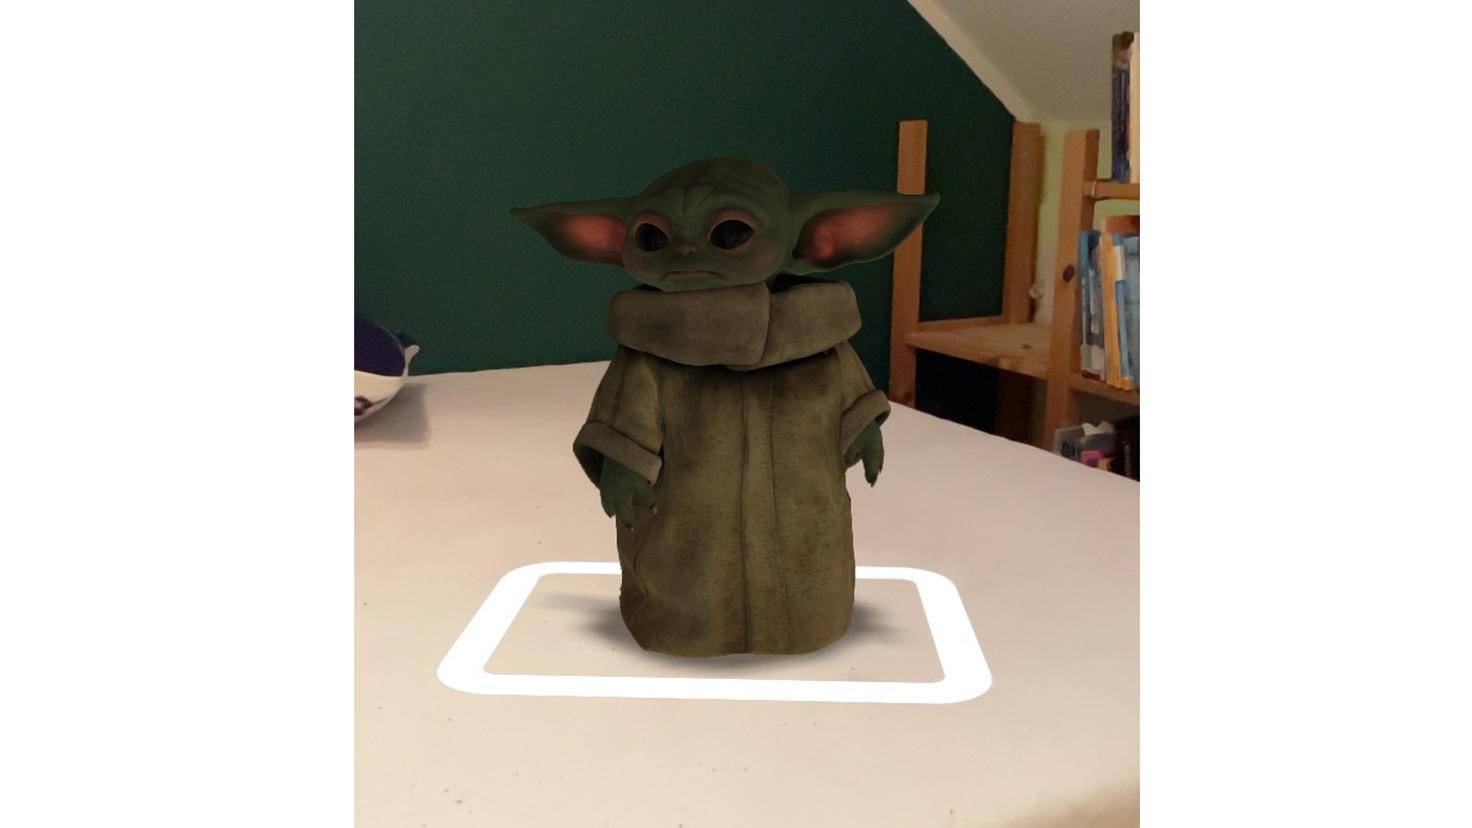 Baby Yoda AR